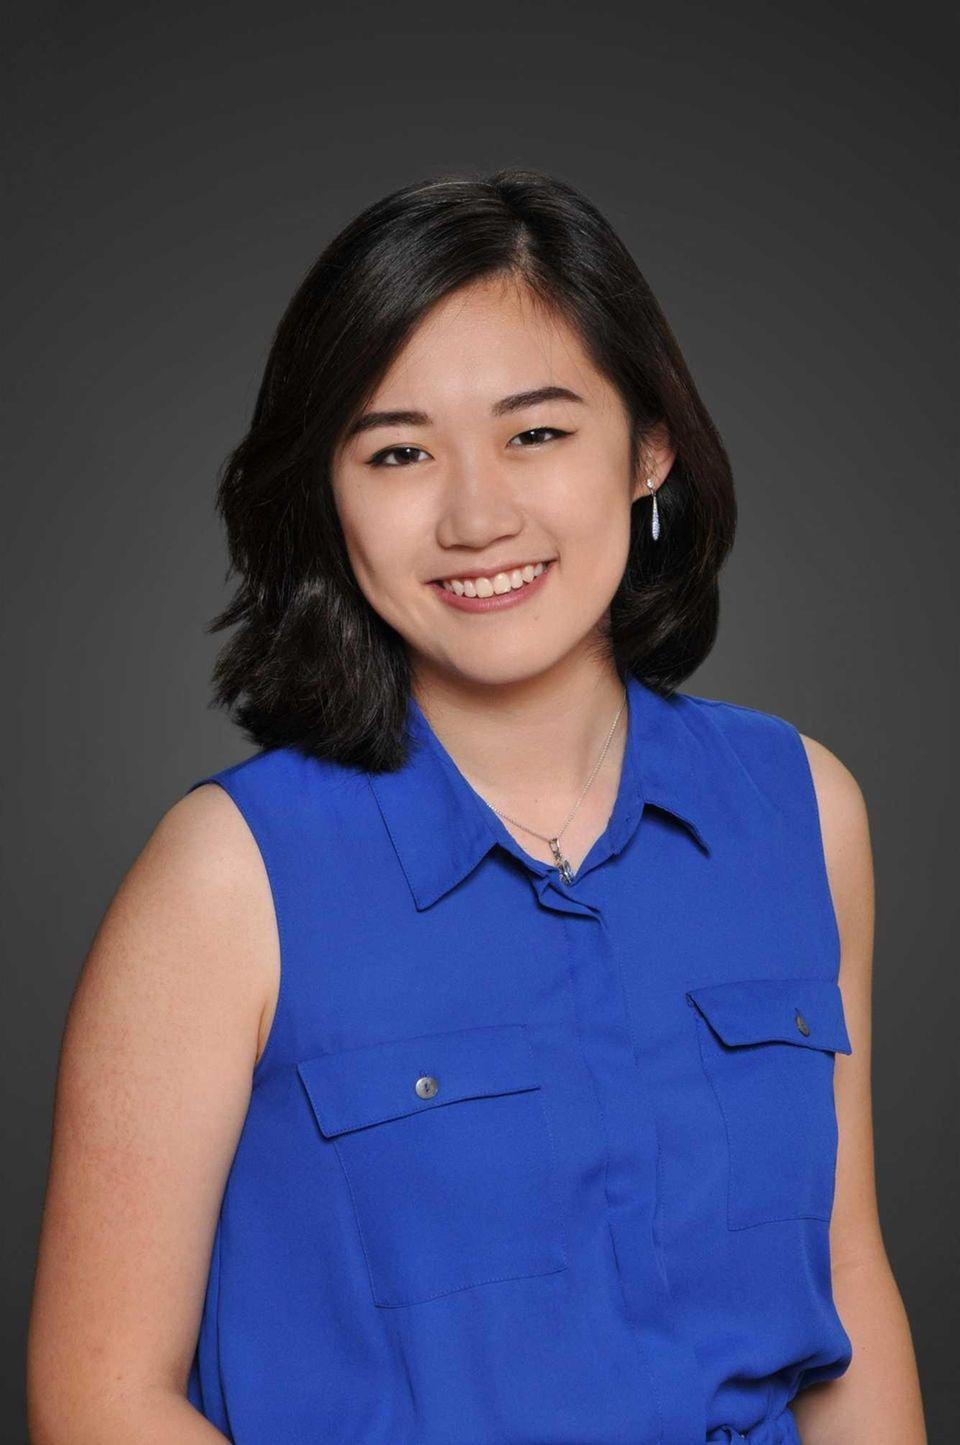 JULIA SHI, STONY BROOK SCHOOL Hometown: Setauket GPA: